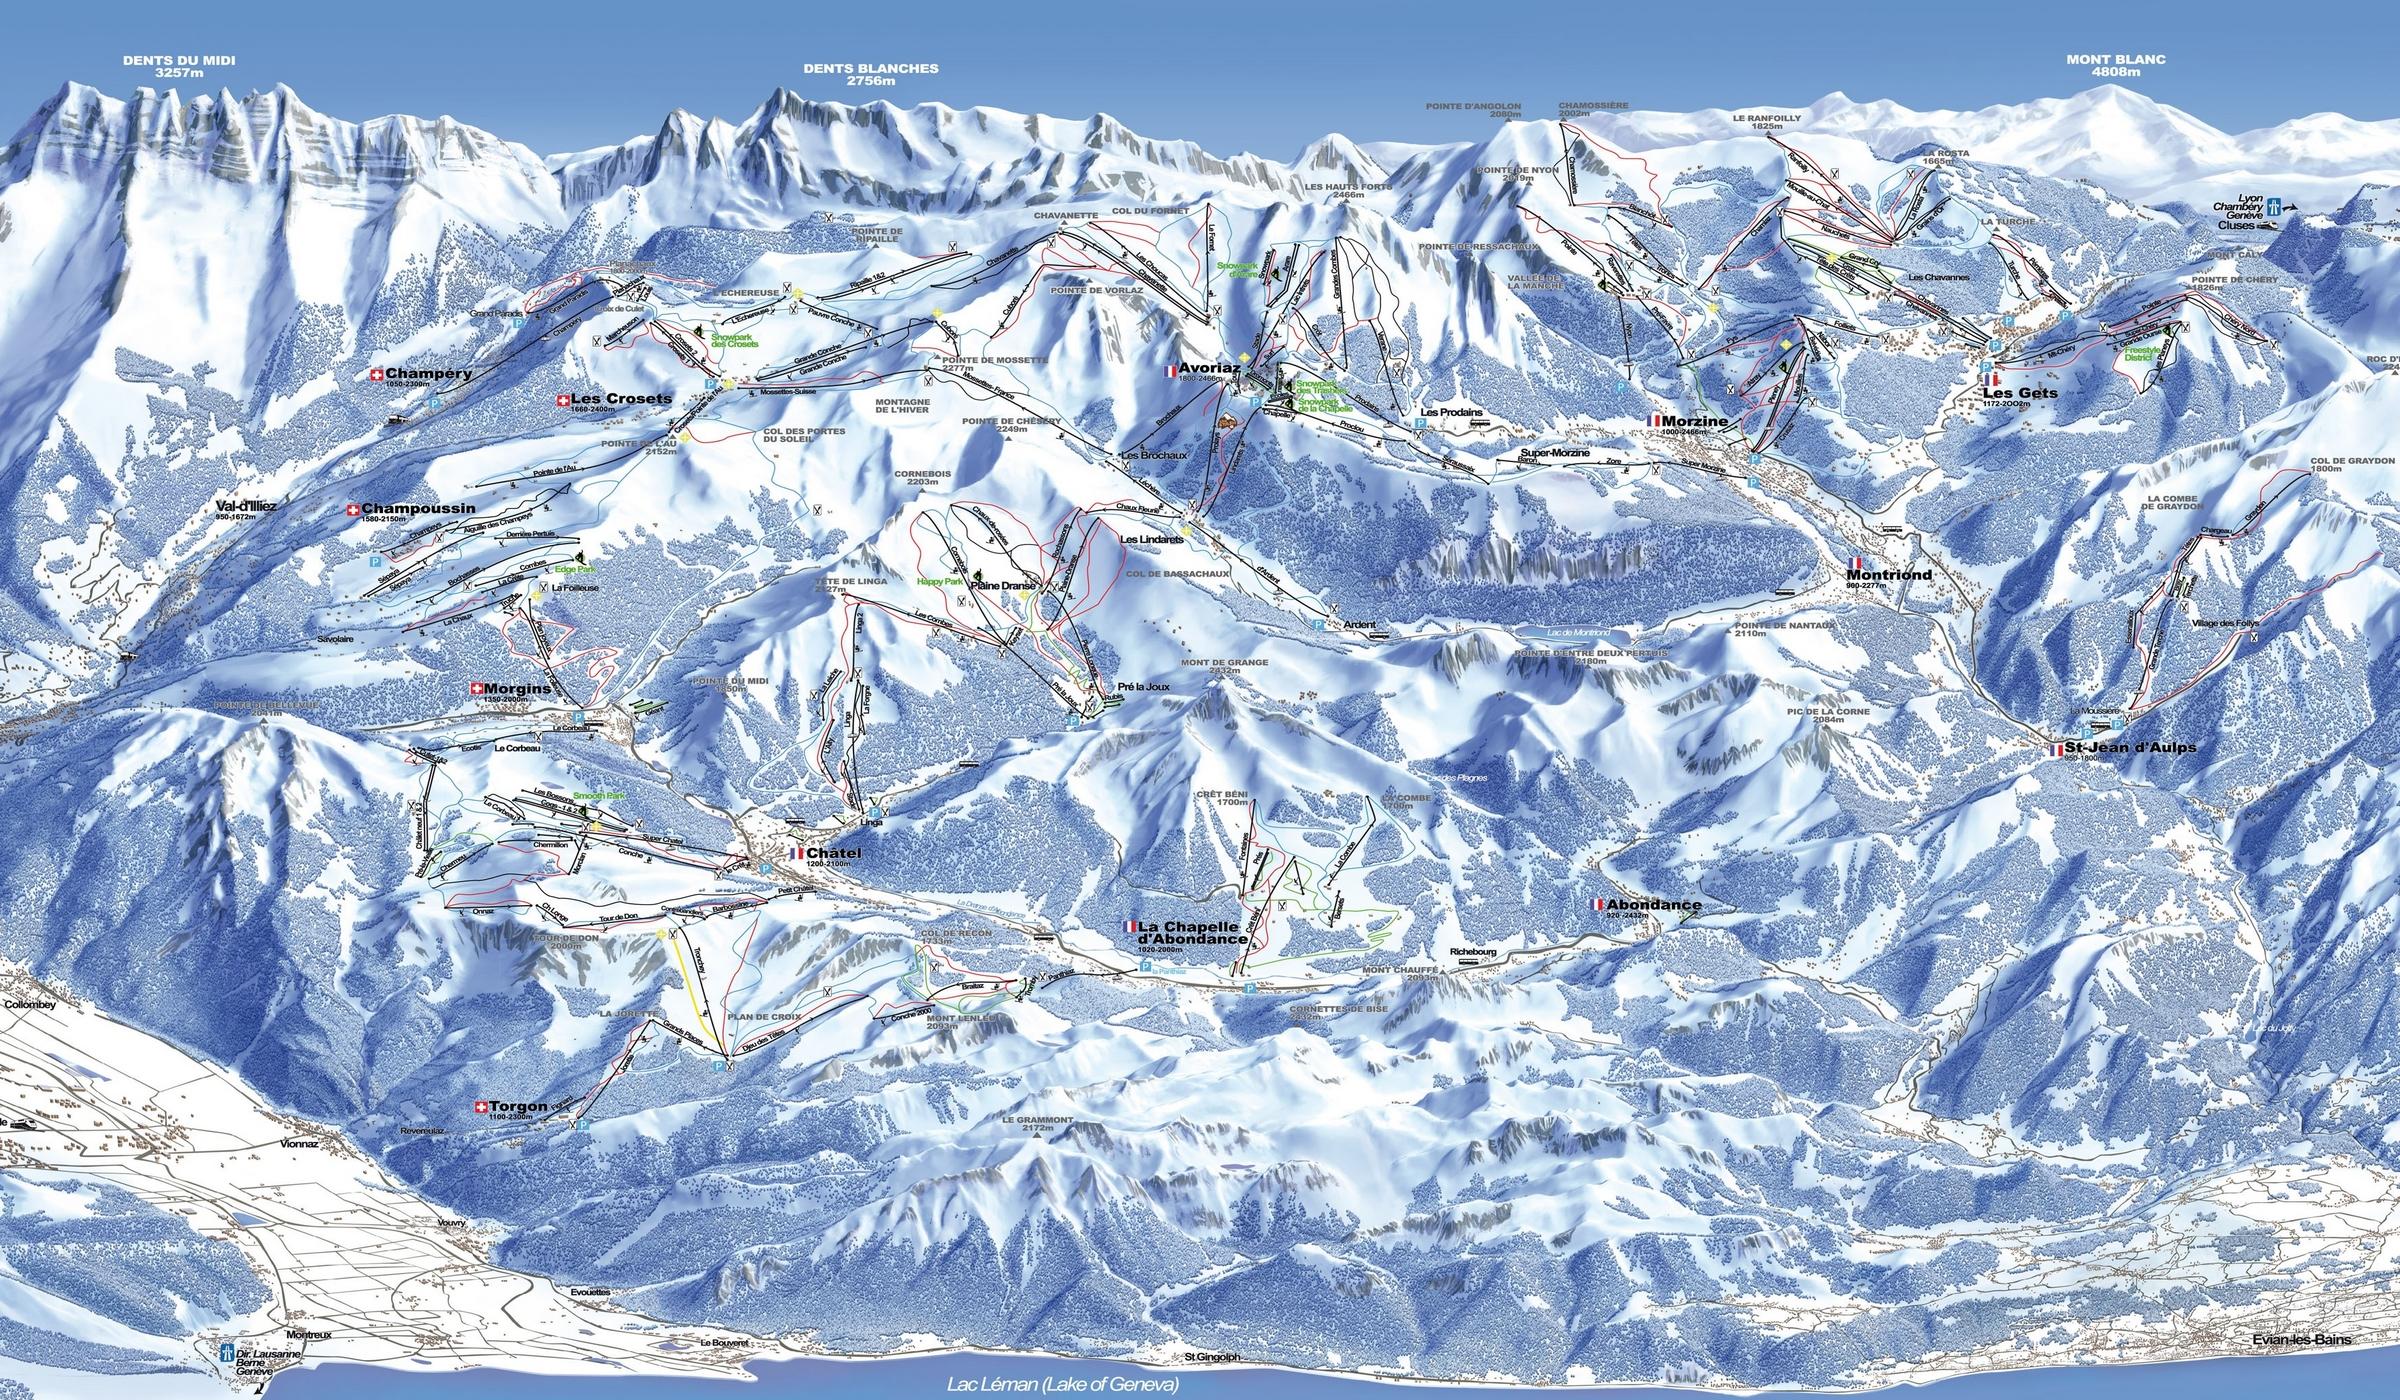 Domaine skiable alpin ski nordique morzine plan des pistes morzine planeteski - Office de tourisme de morzine ...